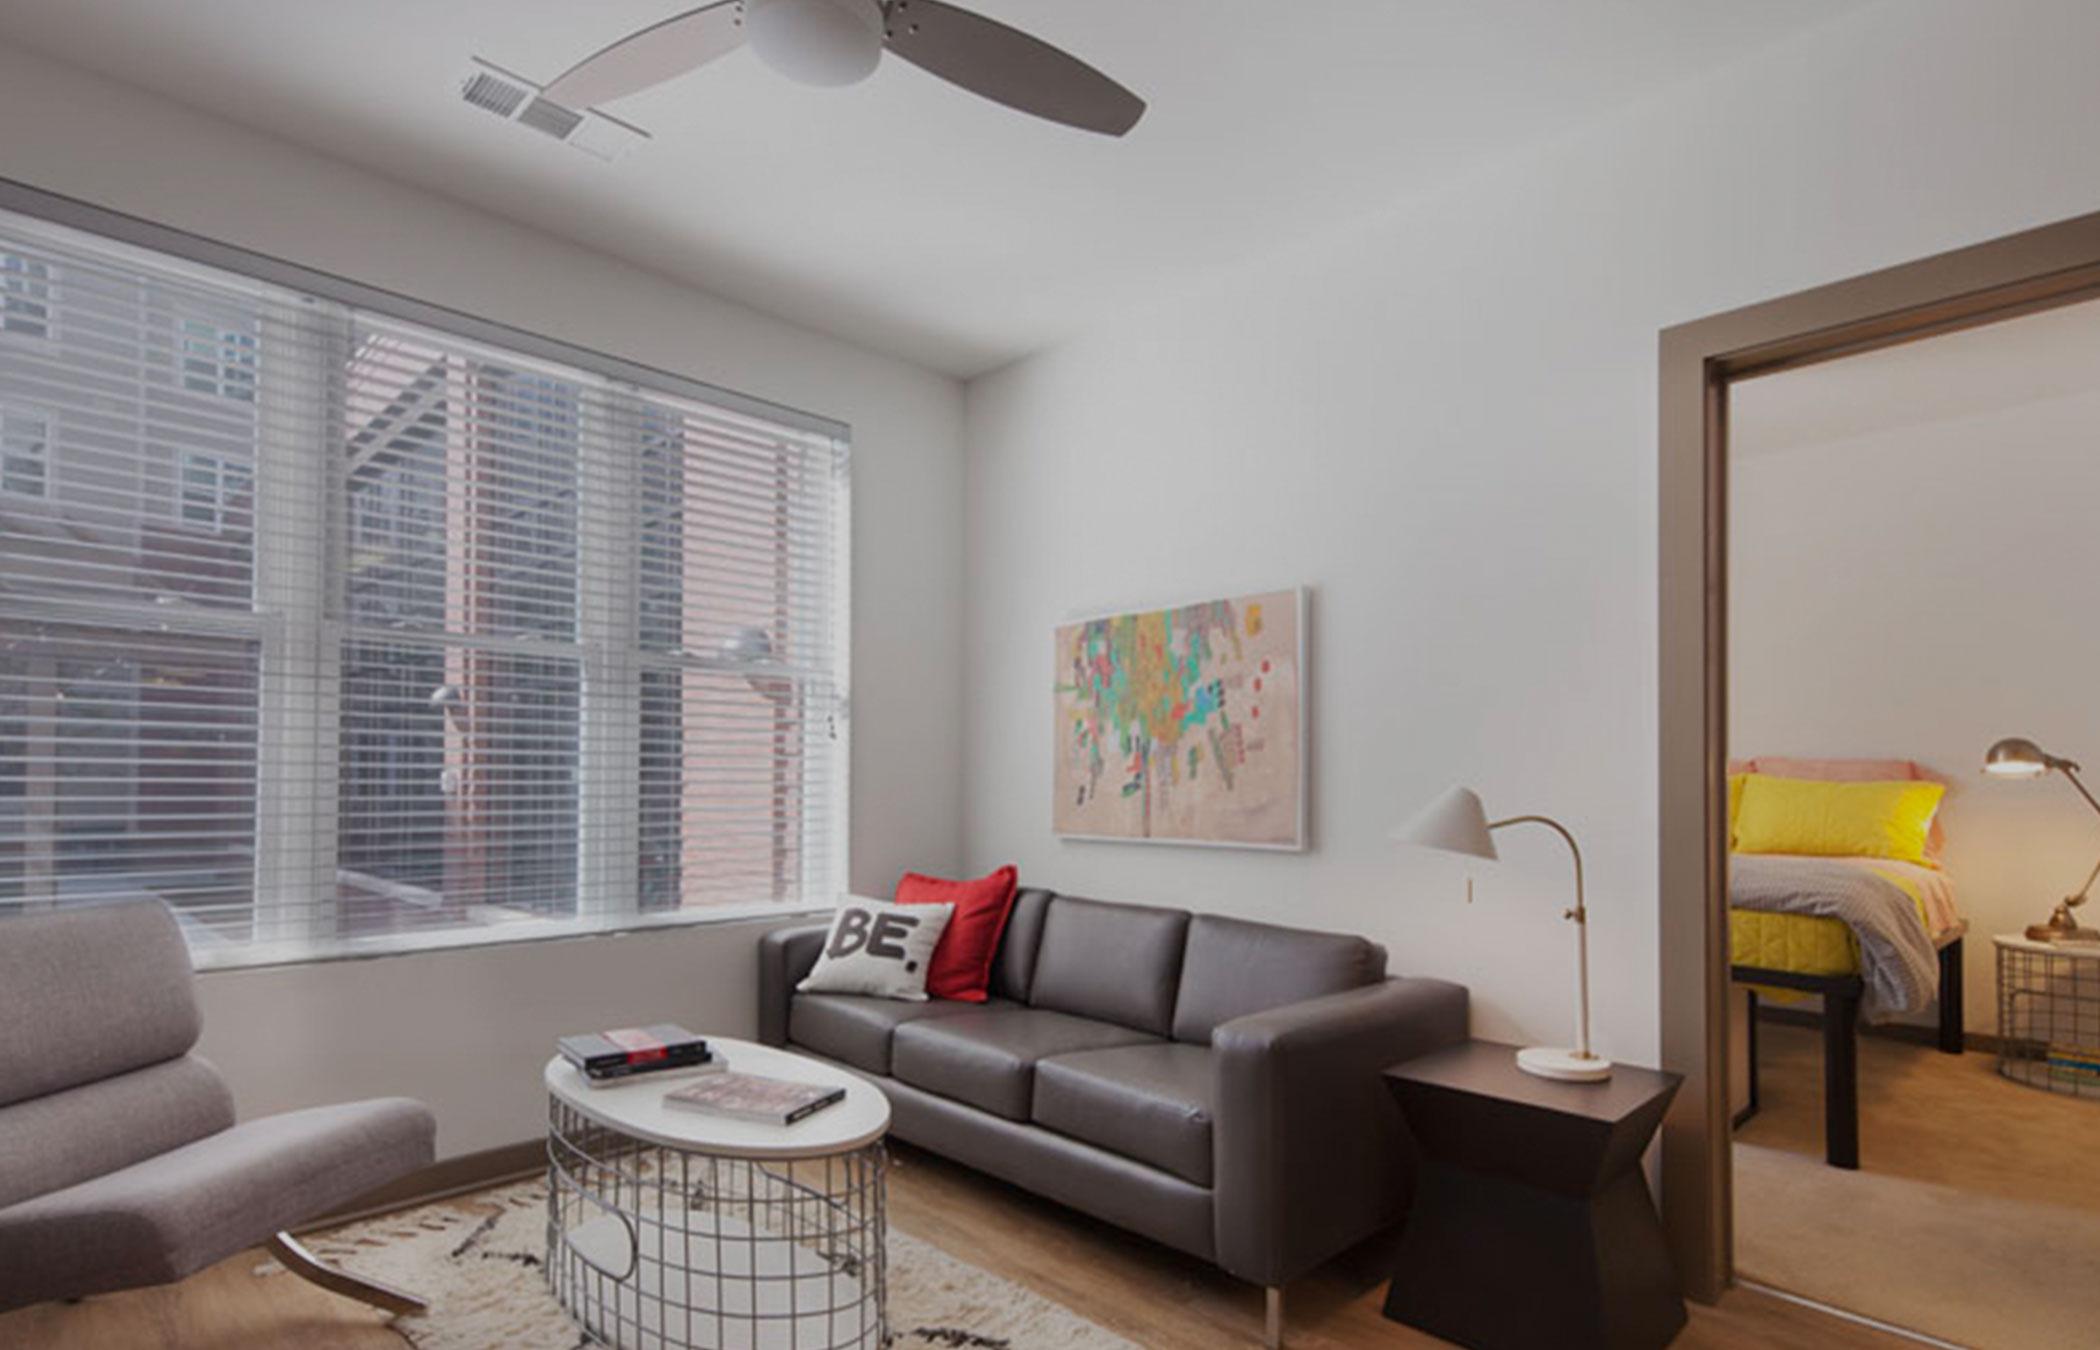 Stanhope Apartments floorplans